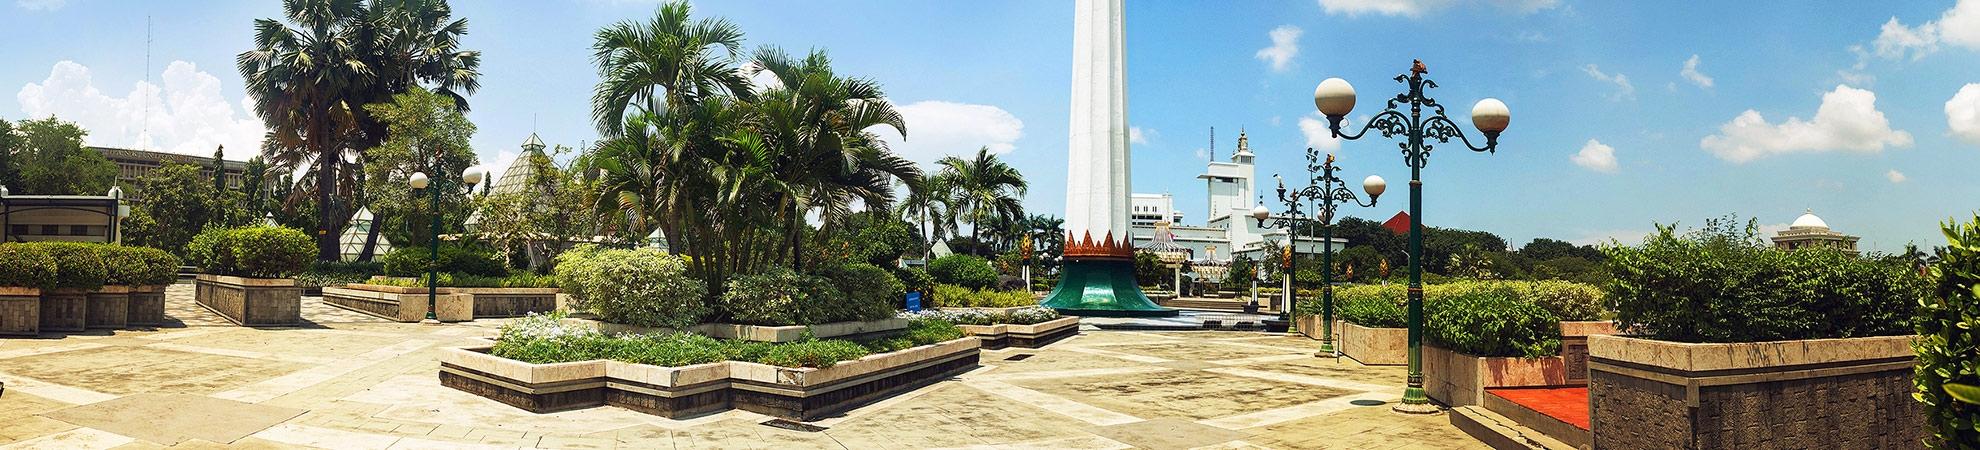 Voyage Surabaya